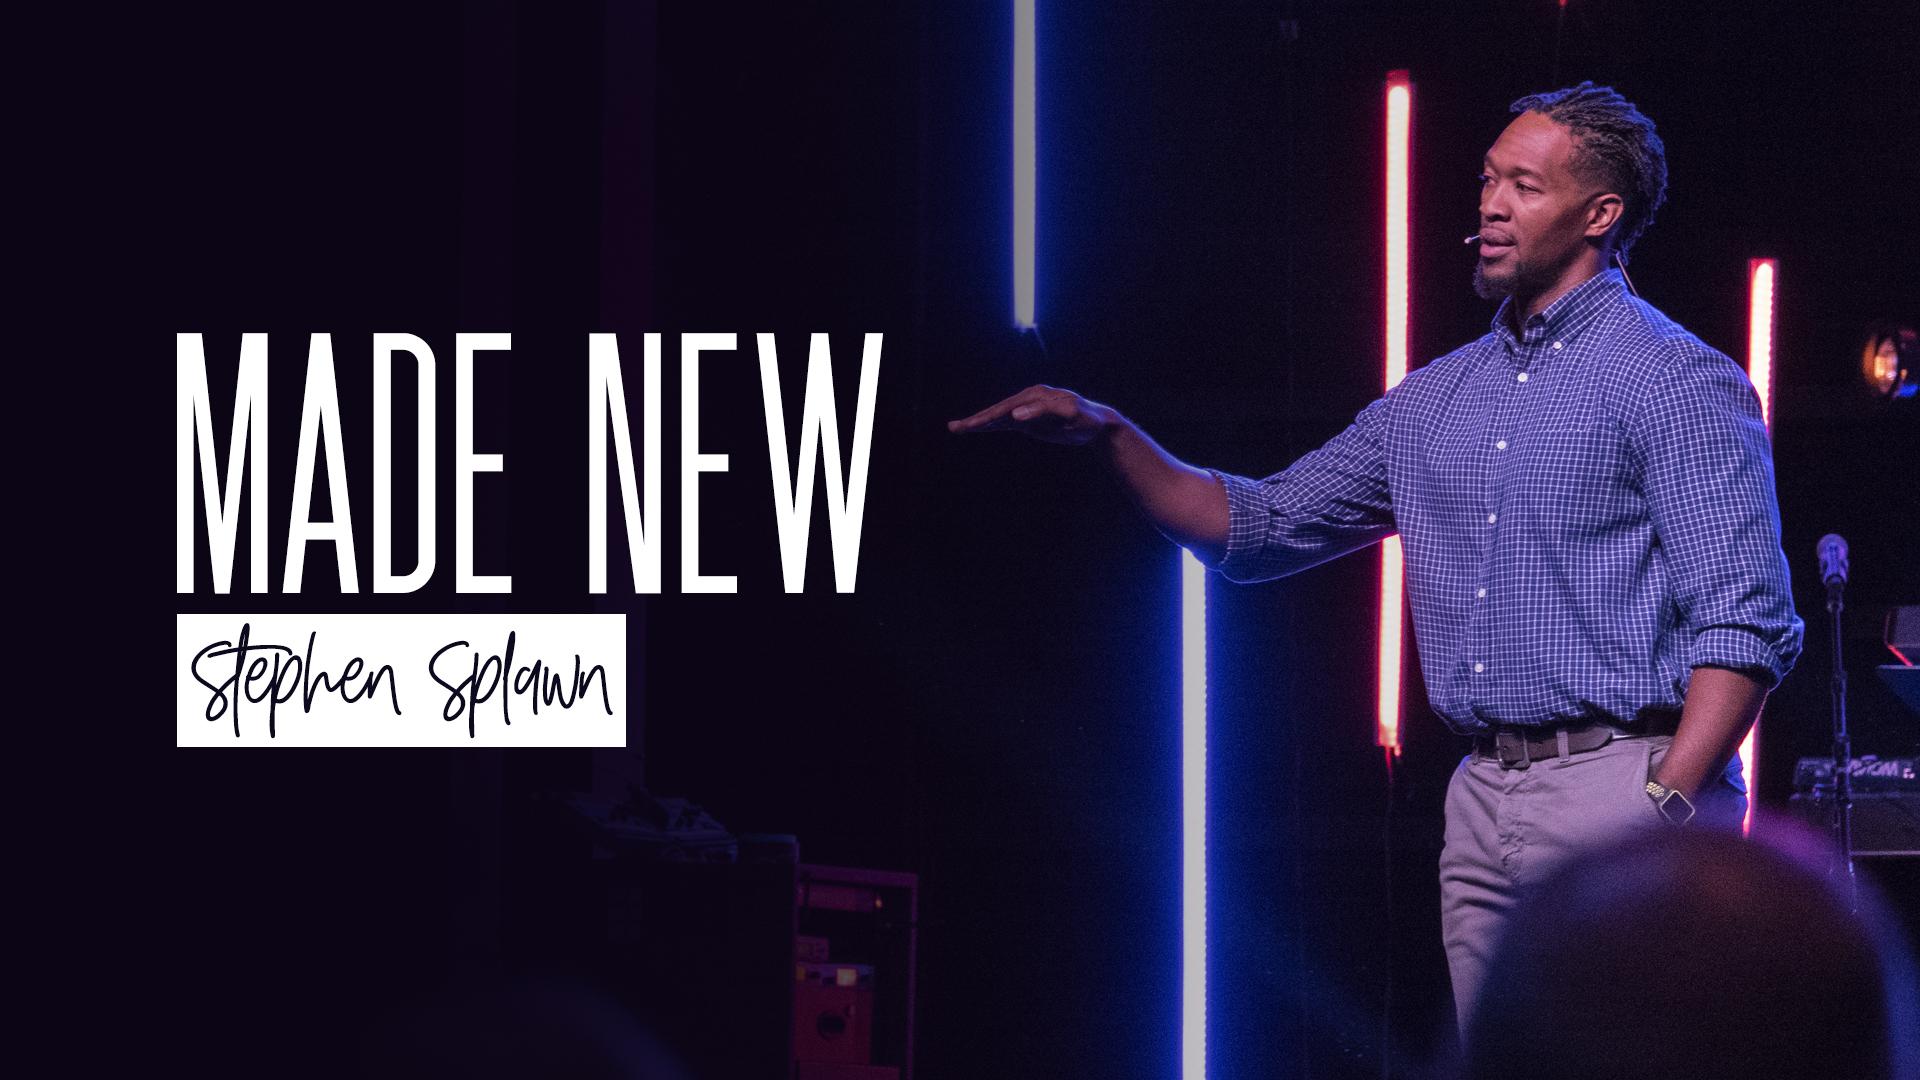 Made New – Stephen Splawn